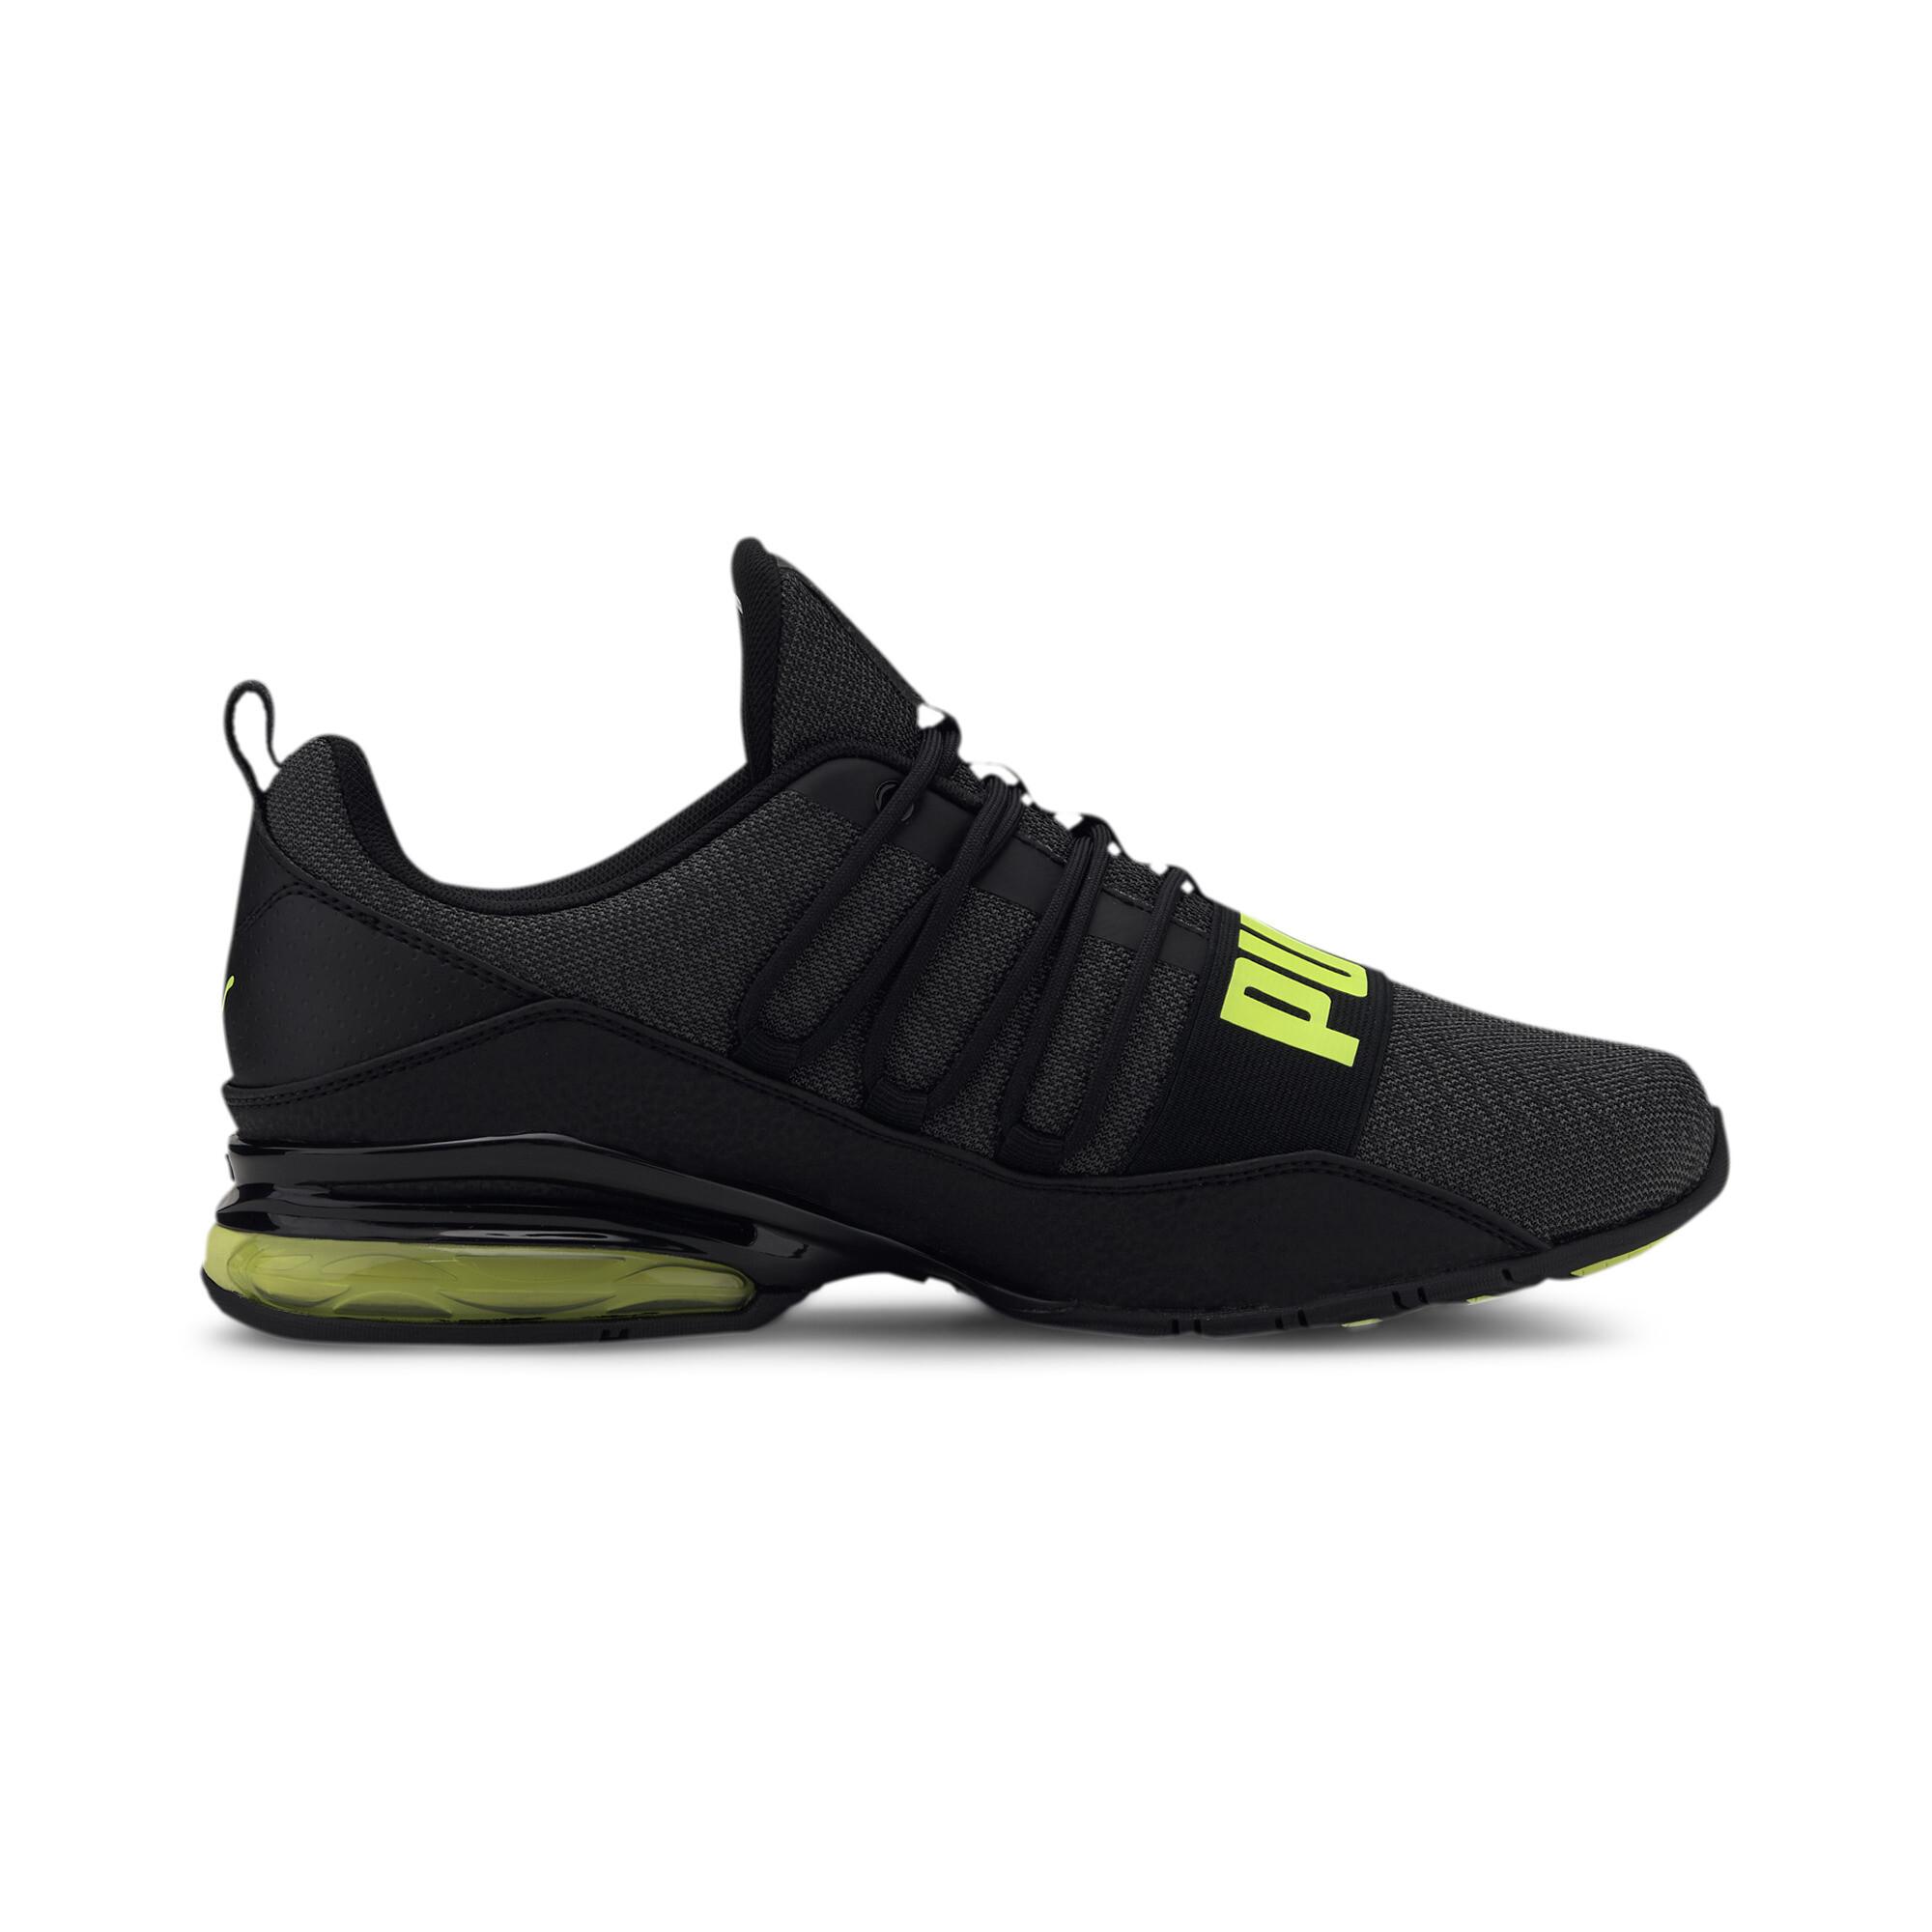 PUMA-Men-039-s-CELL-Regulate-Bold-Training-Shoes thumbnail 21